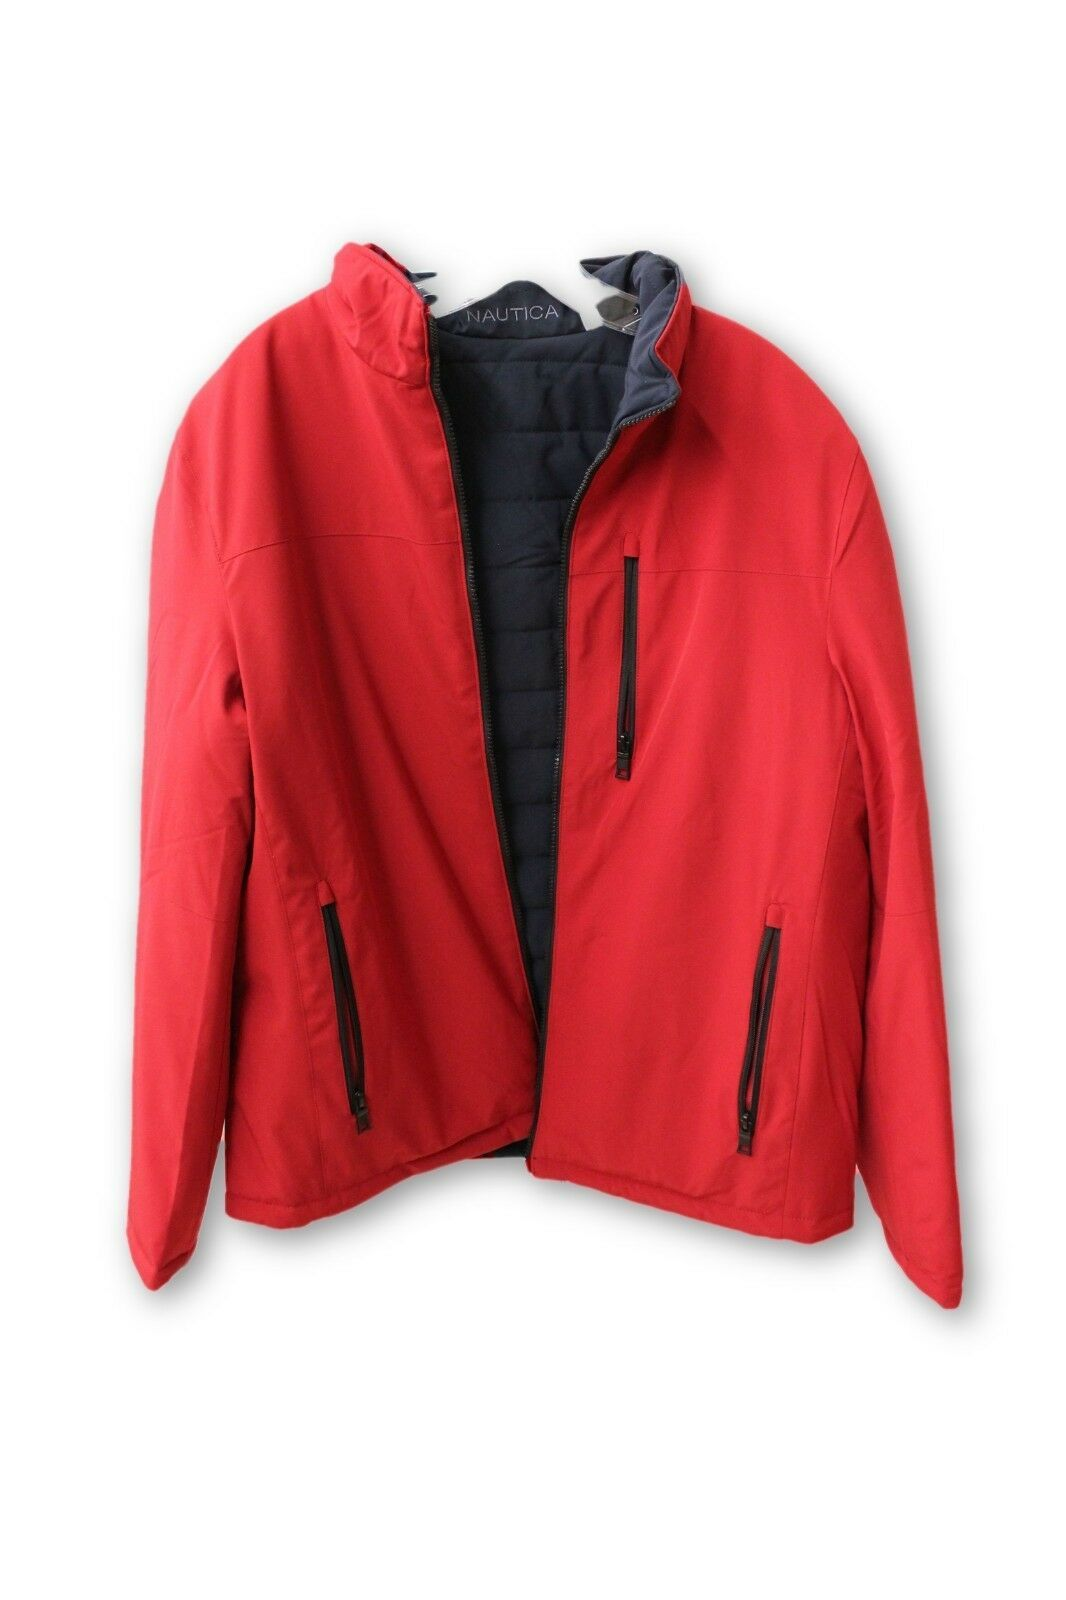 Adidas Bomber Jacket: 11 listings